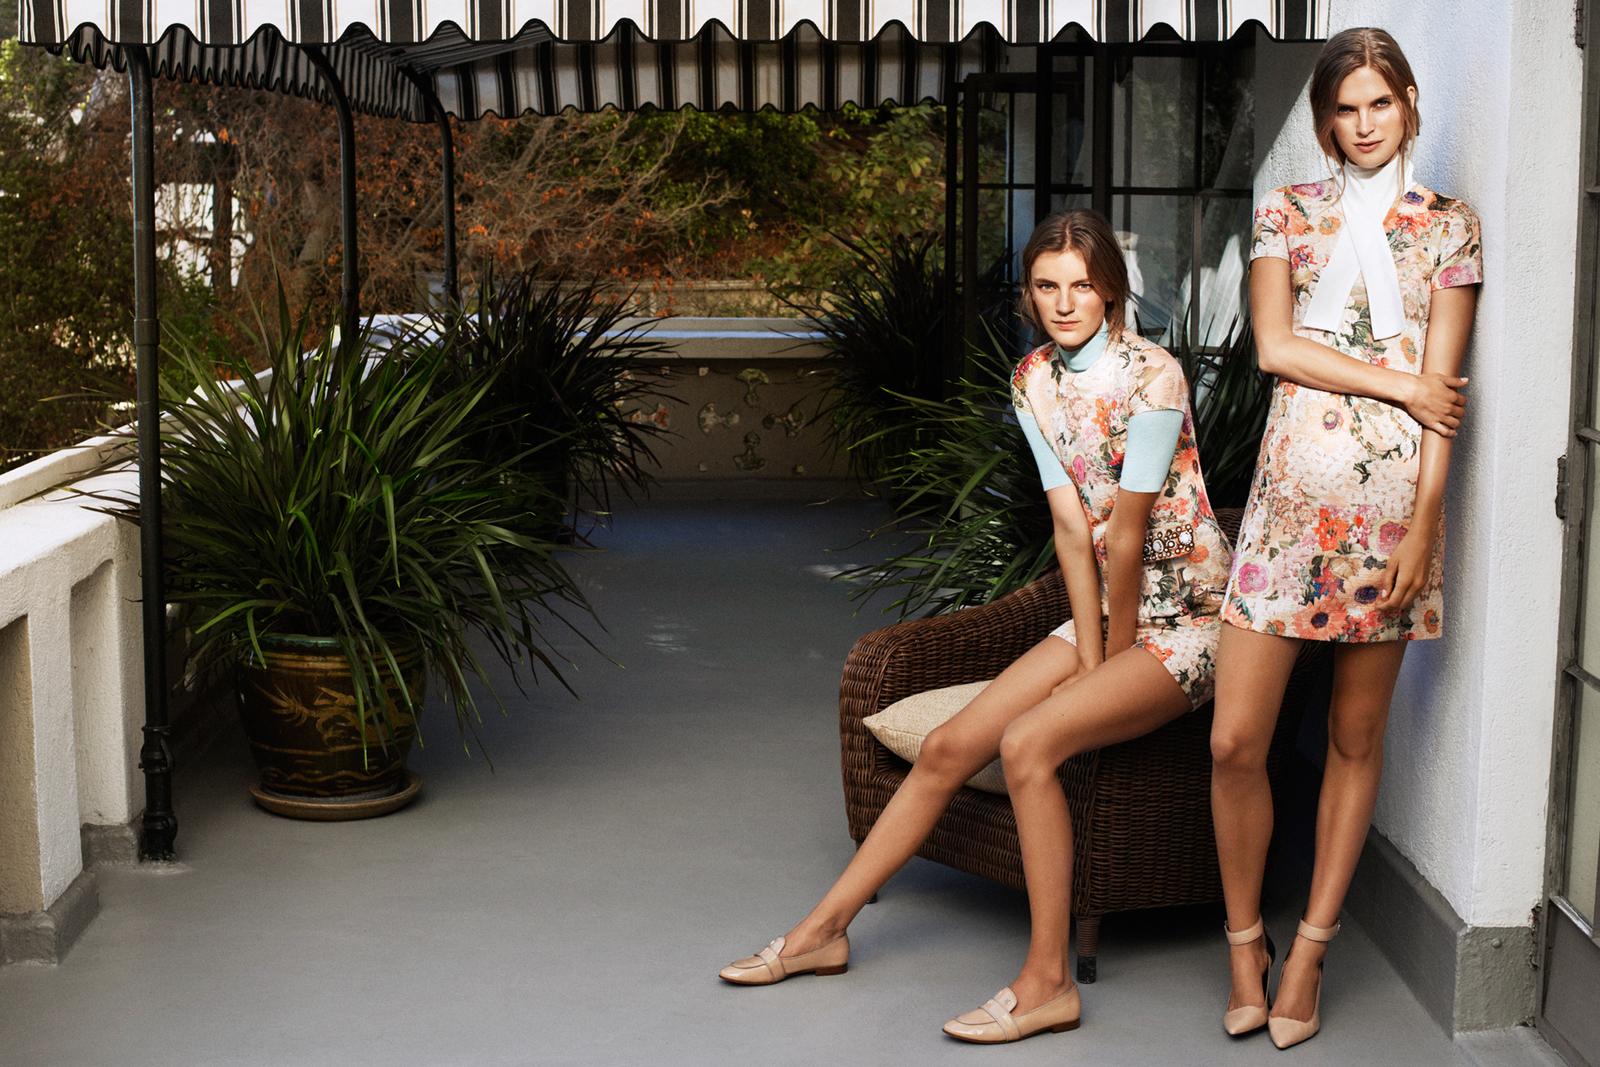 755-laura-kampman-@-tory-burch-resort-2014-by-angelo-pennetta-campaign-lookbook-3.jpg